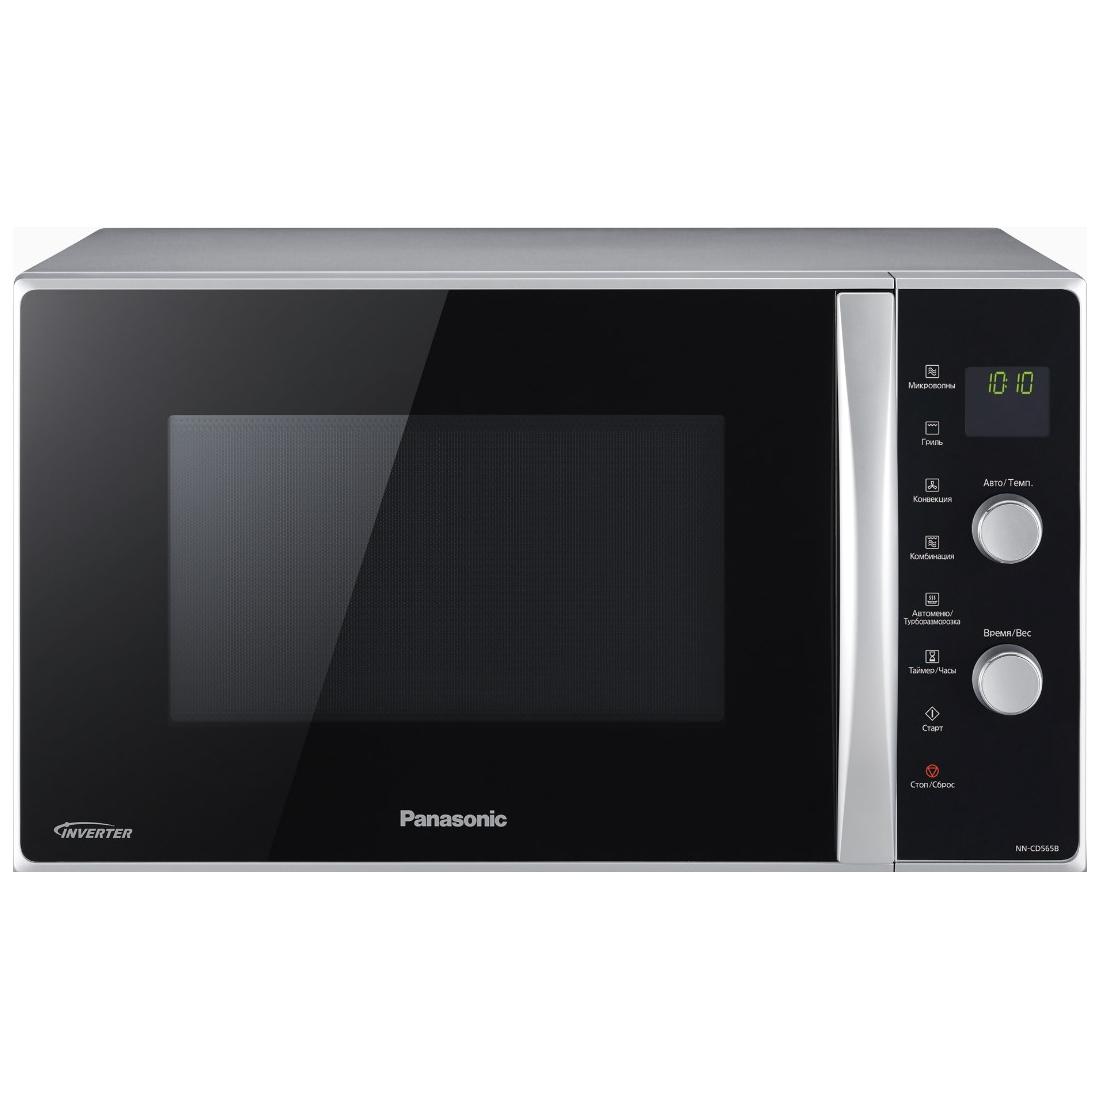 Panasonic Microwave White 27l Bestmicrowave